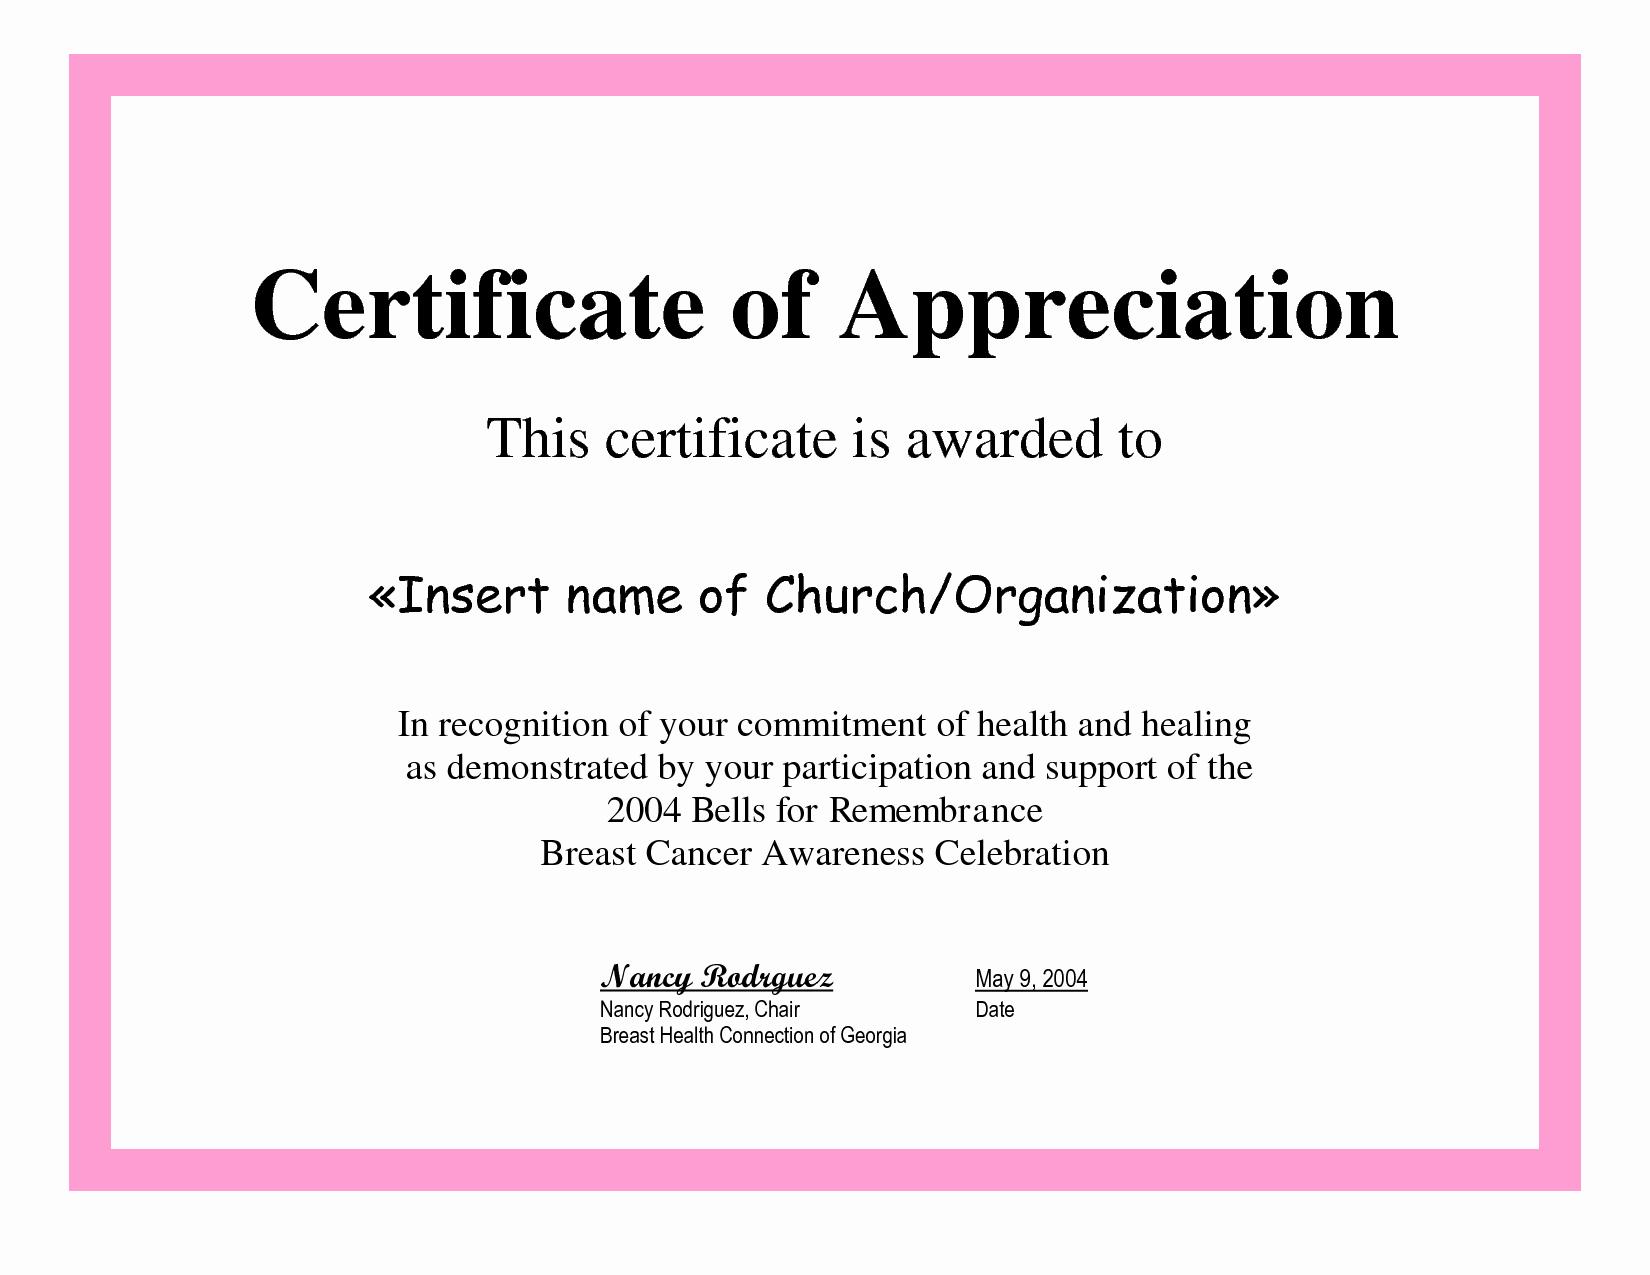 Sample Of Certificate Of Appreciation Best Of 7 Best Of Printable Certificates Appreciation